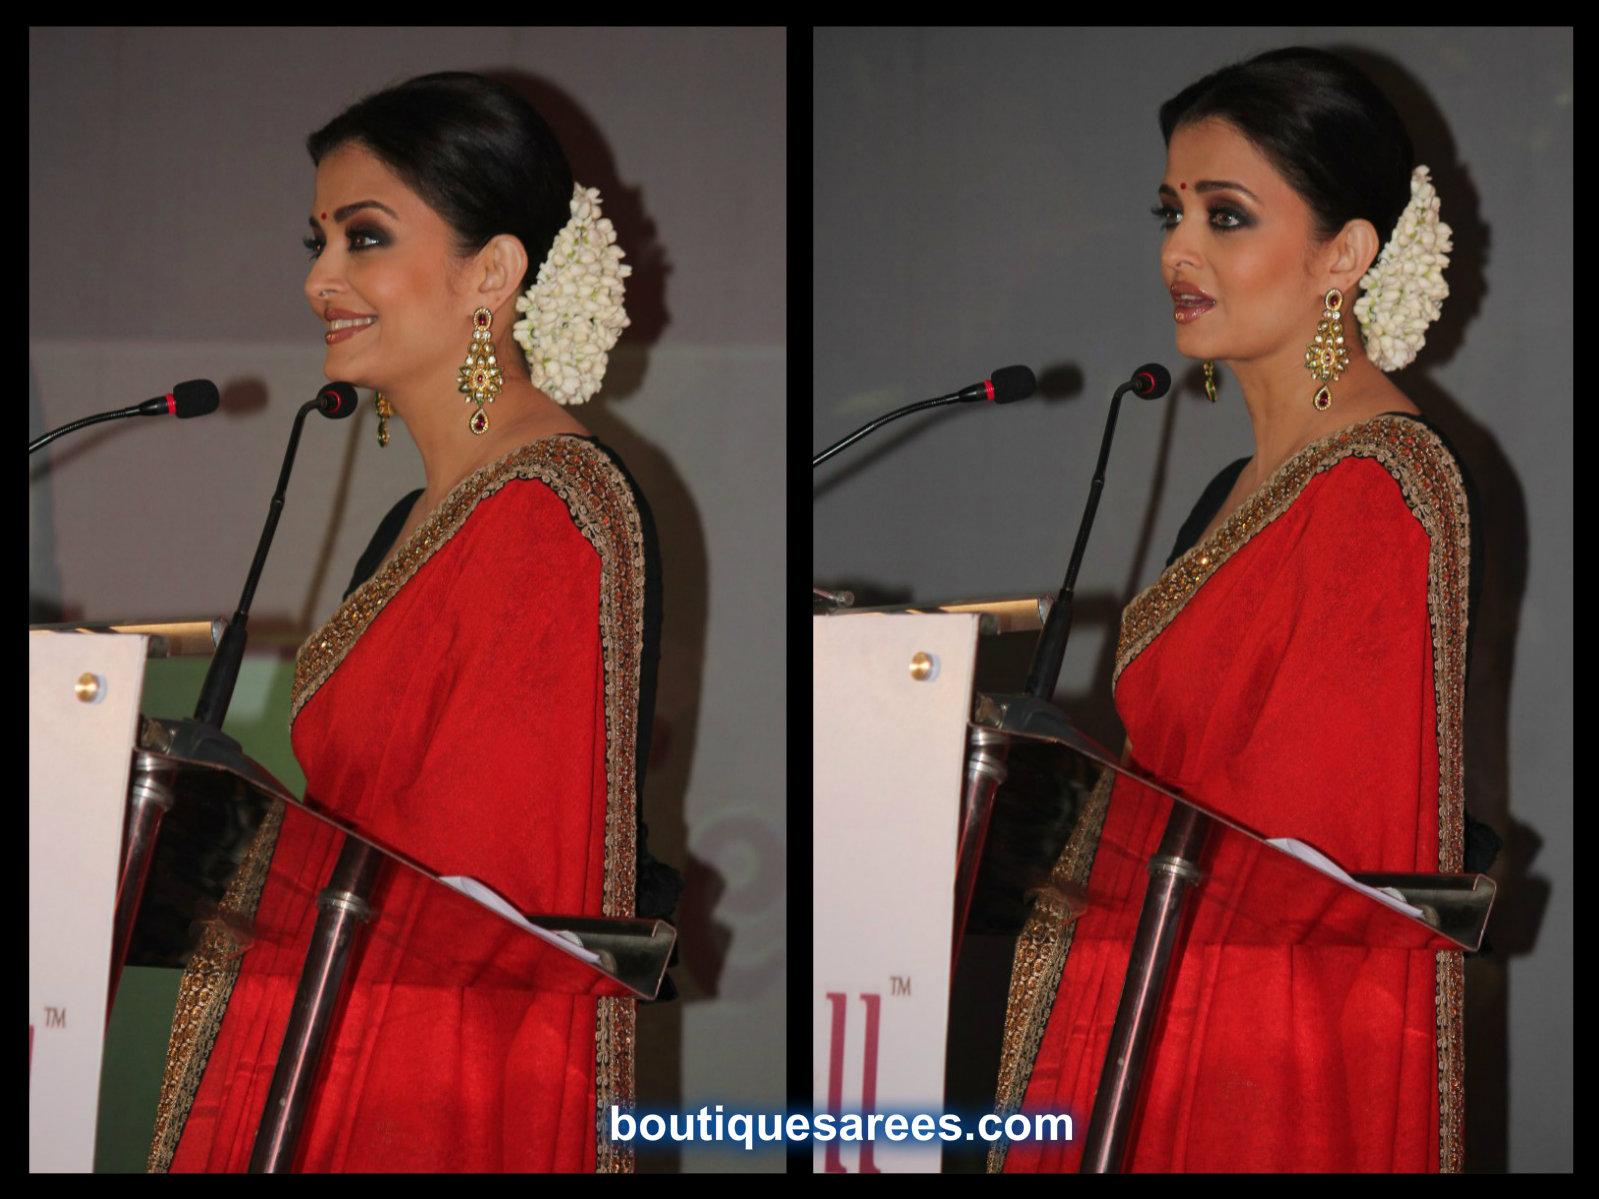 aishwarya rai in red saree